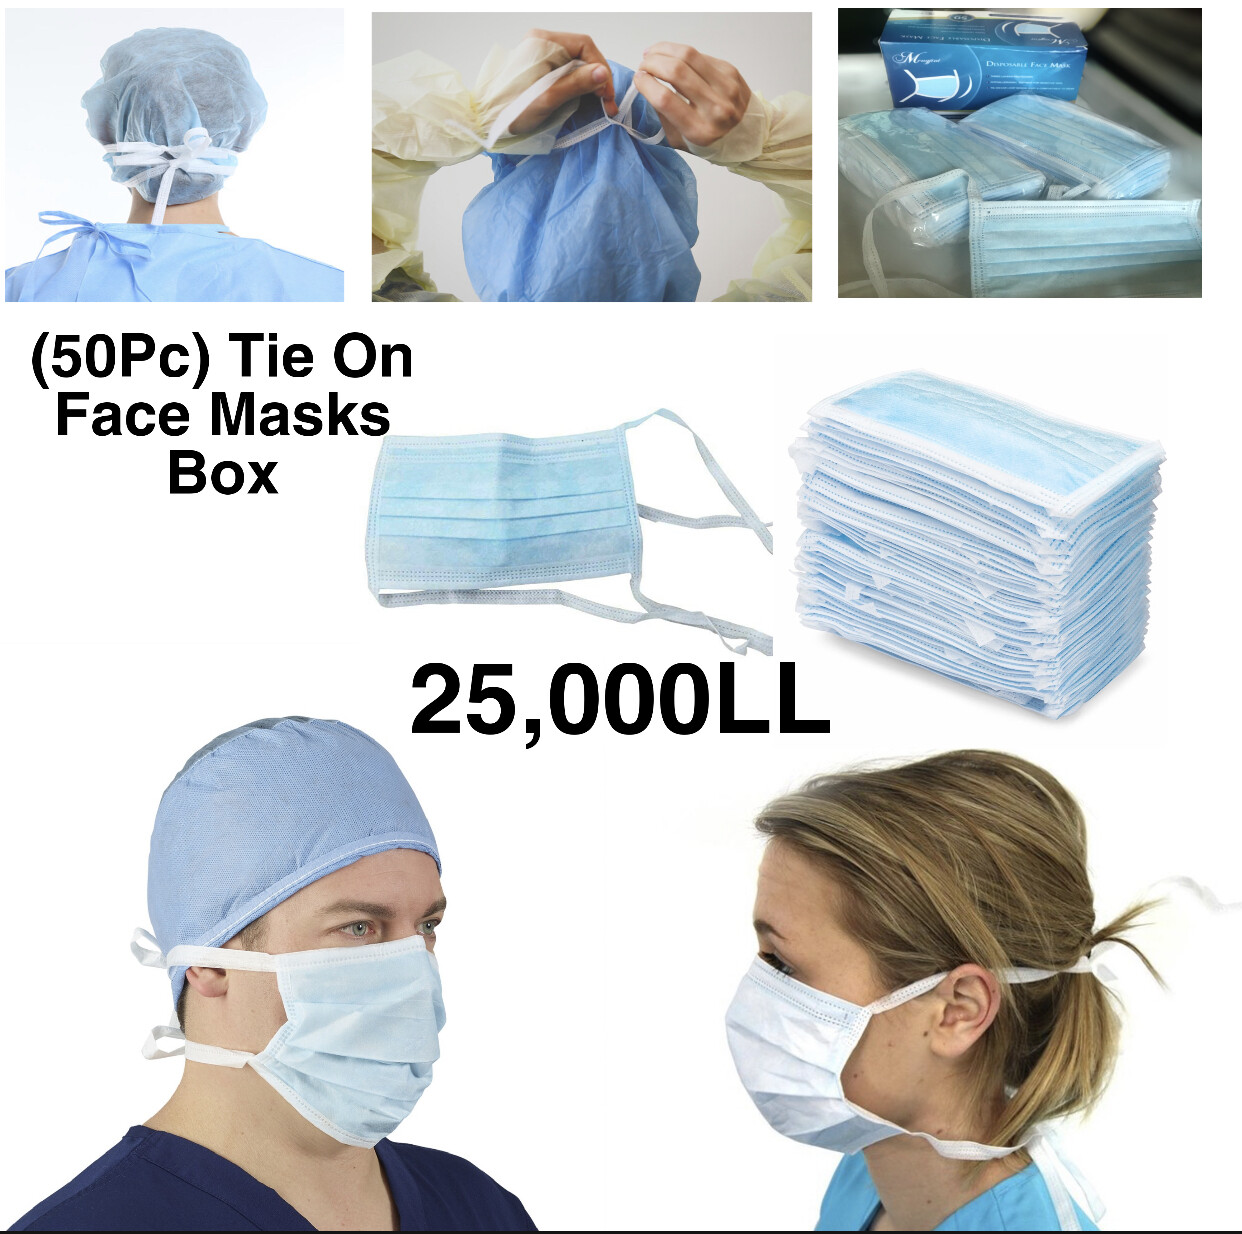 Tie-On Face Masks Box